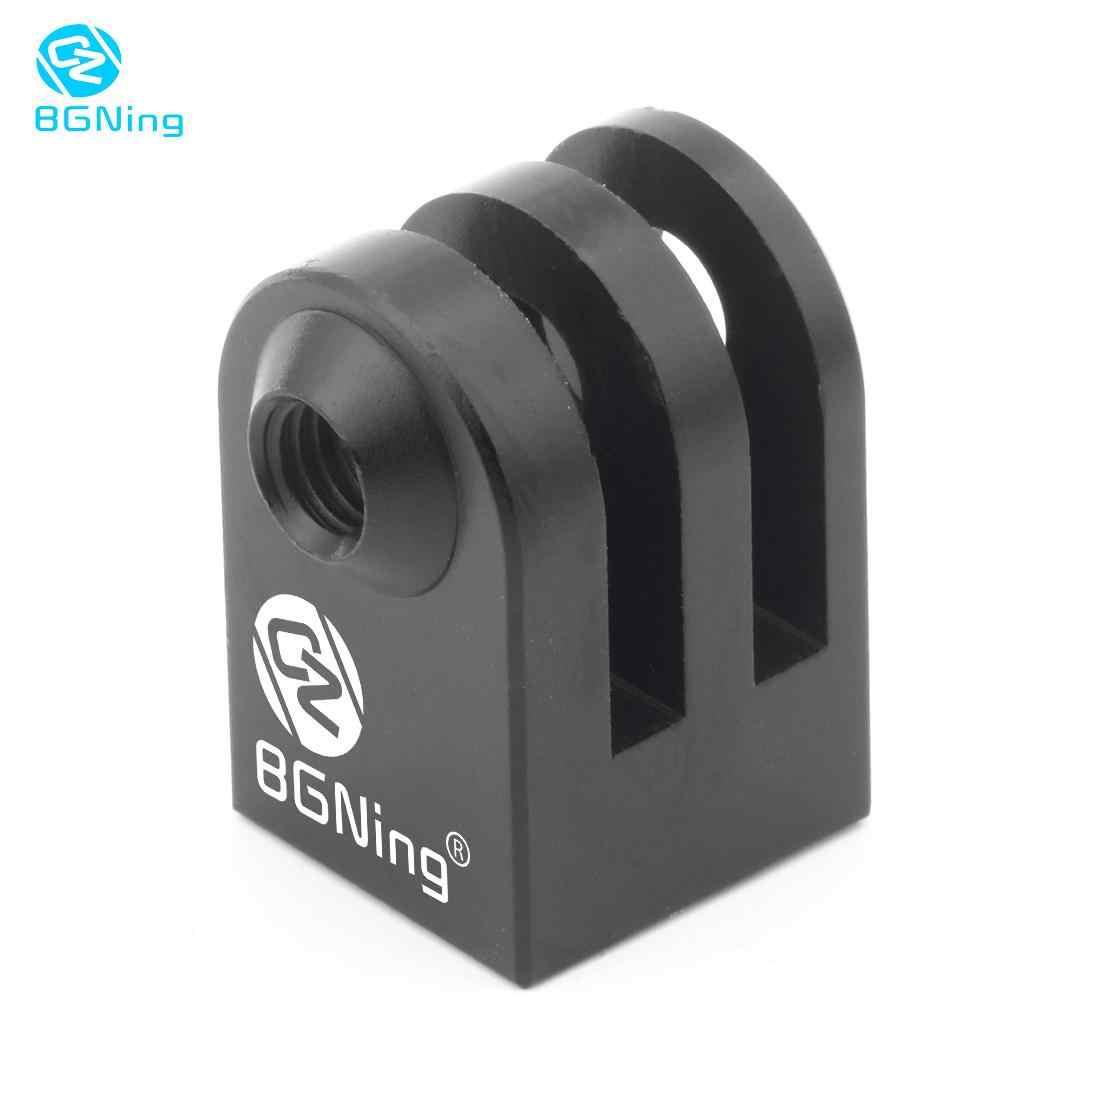 "Aluminium Mini Tripod Mount Kamera Olahraga Outdoor Dasar Adaptor untuk GoPro SupTig Semua 1/4 ""Sekrup Monopod"